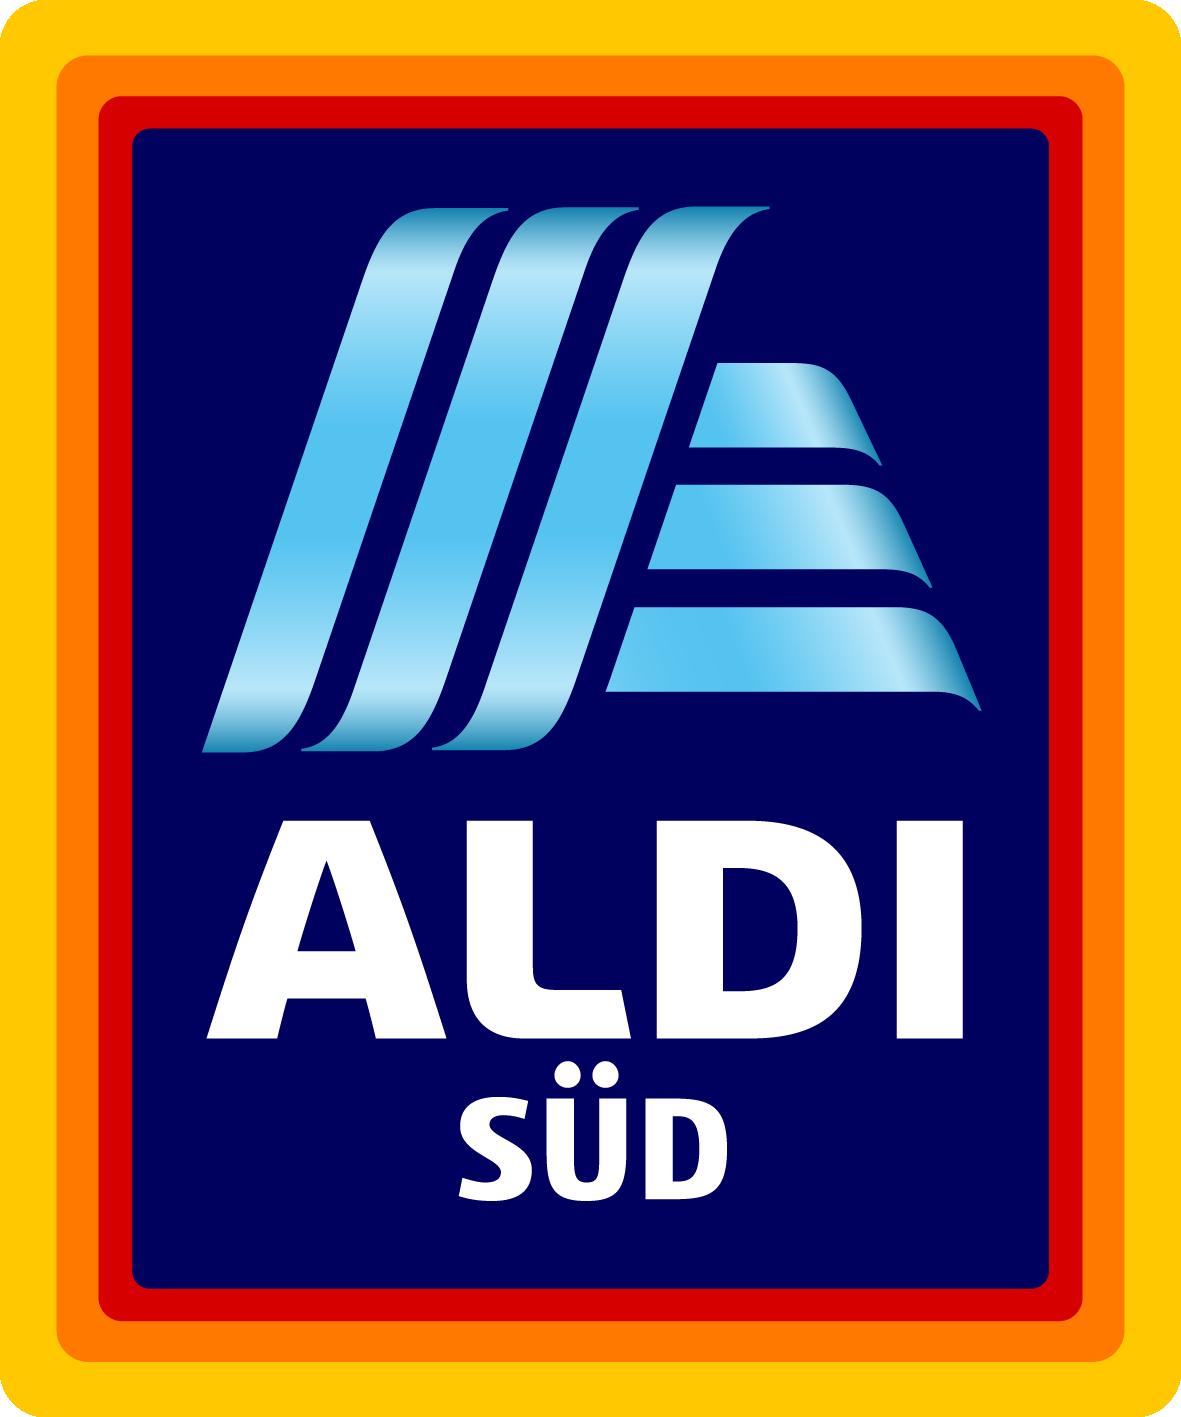 https://cottonmadeinafrica.org/wp-content/uploads/ALDI-SÜD-Logo_Web.png